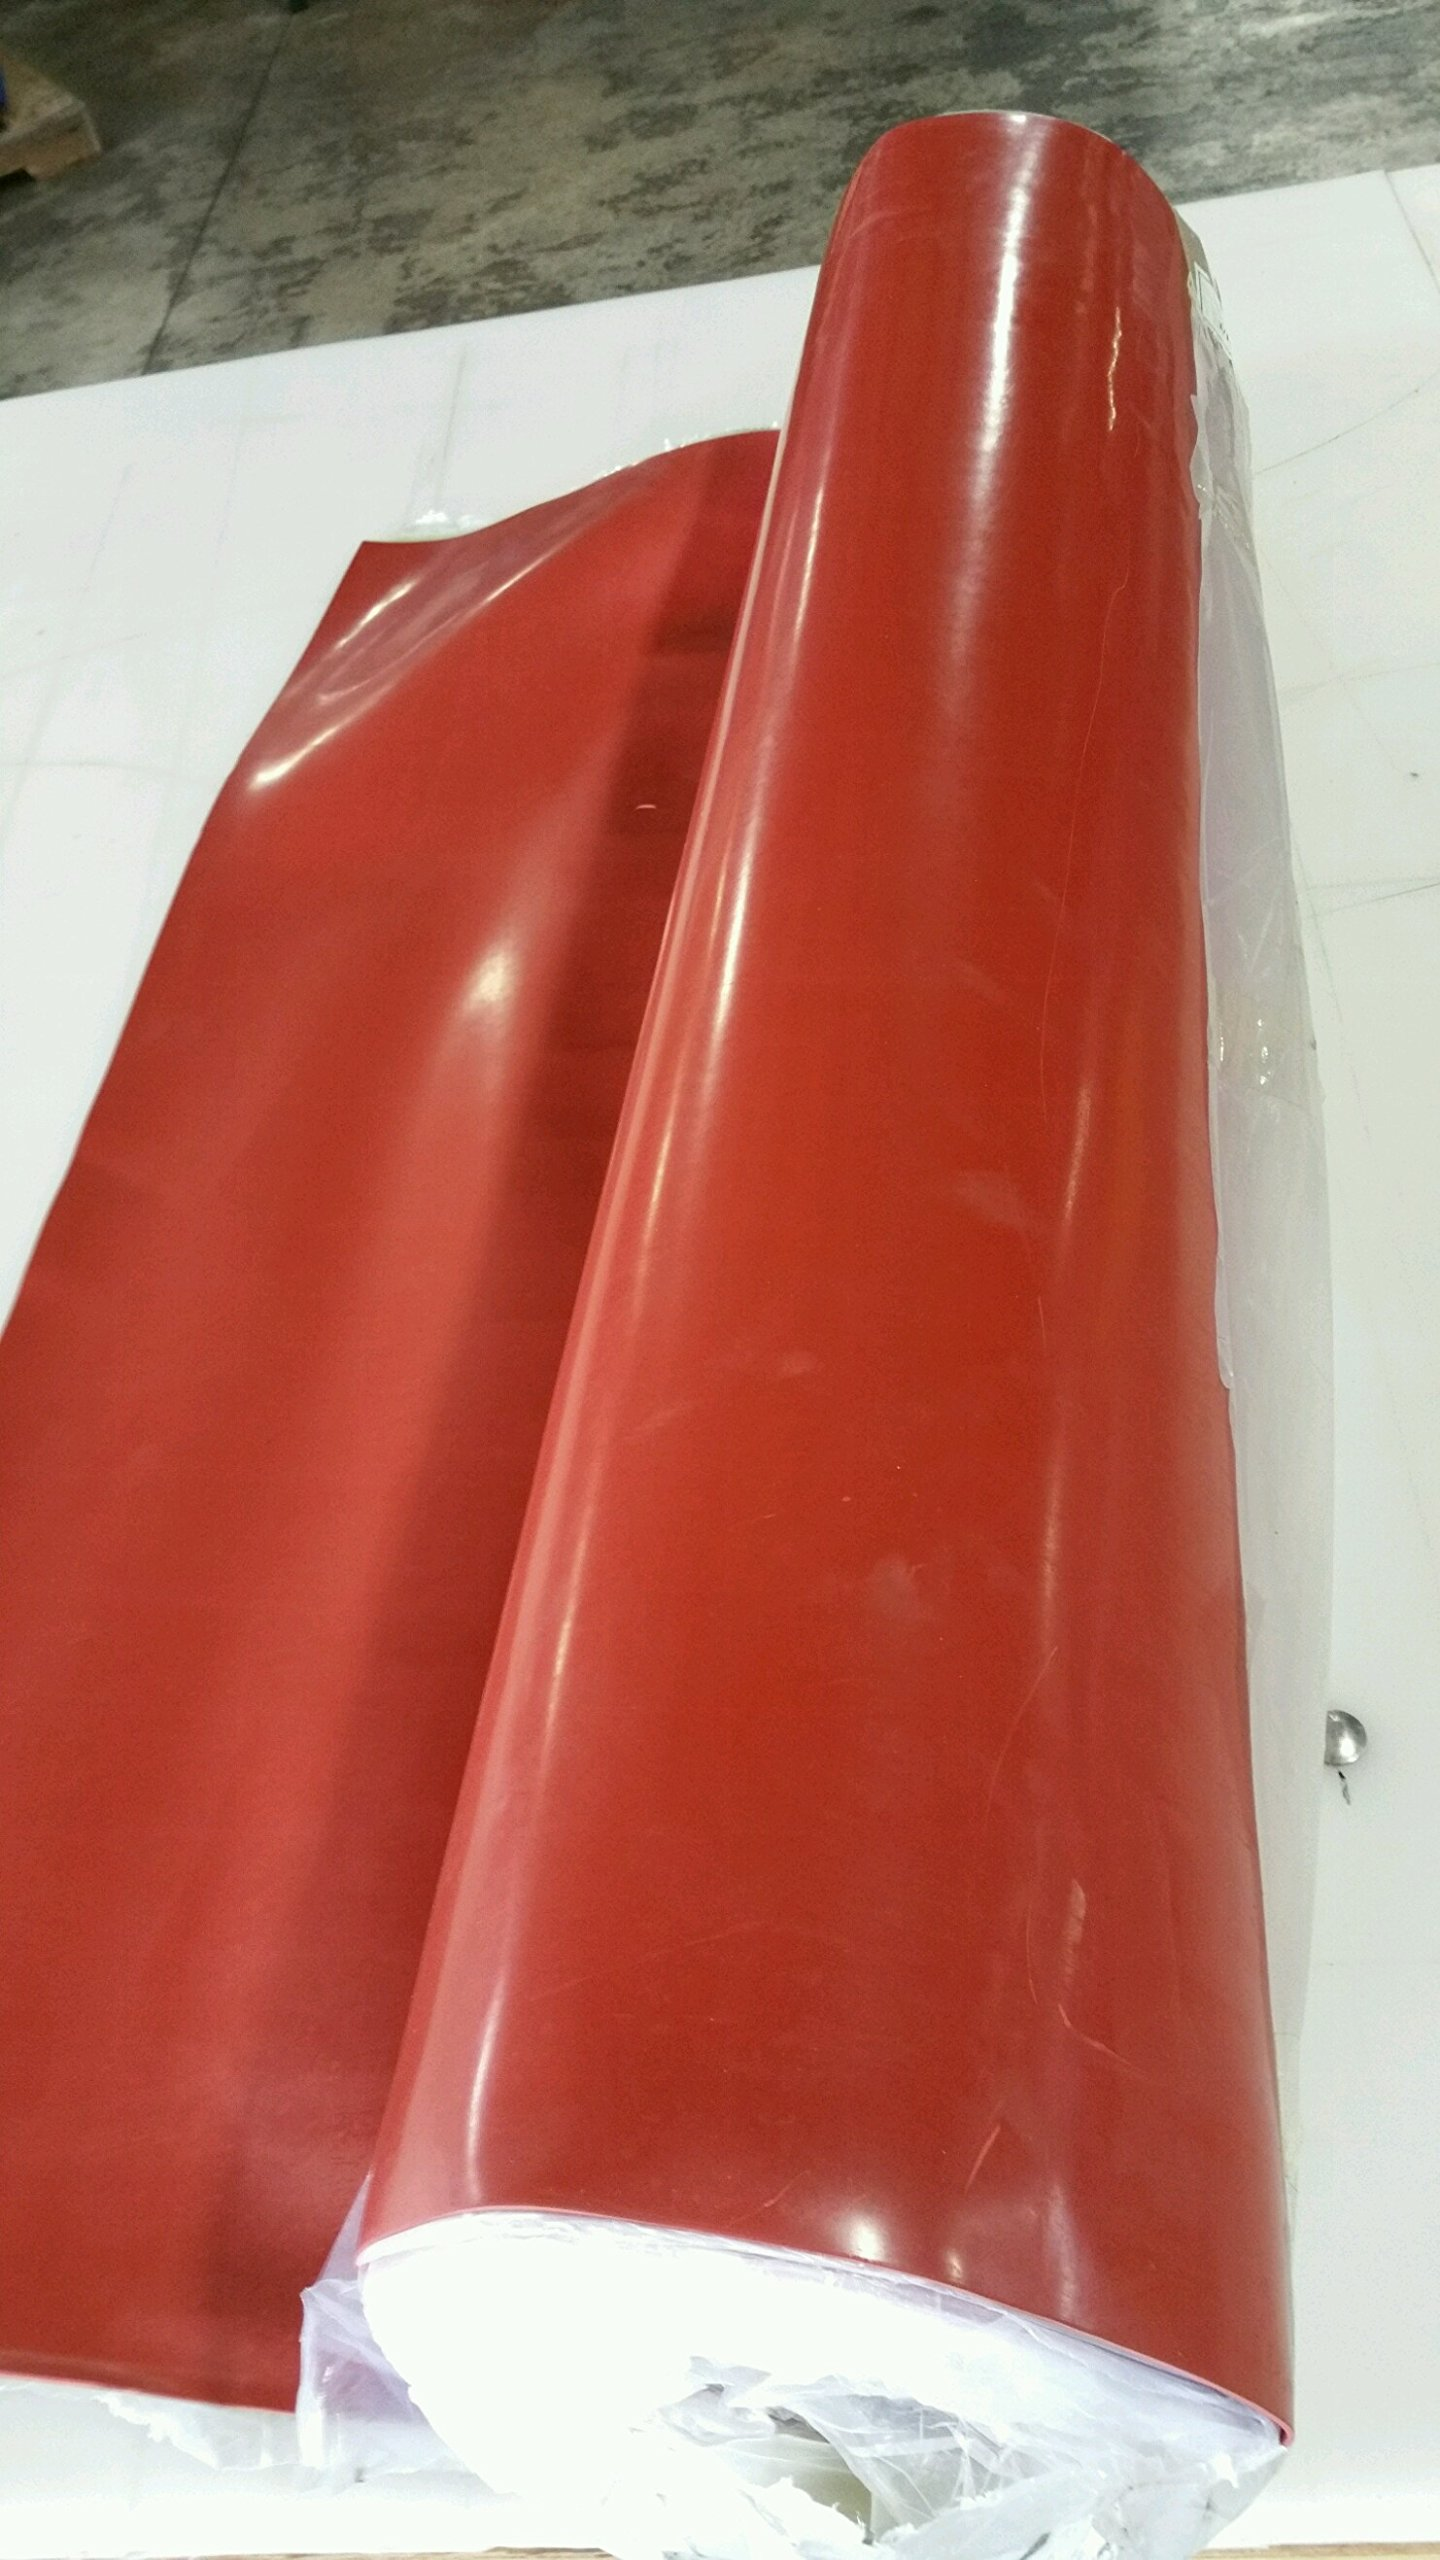 1/16'' x 36'' x 50' Red SBR Rubber Rolls 75 durometer